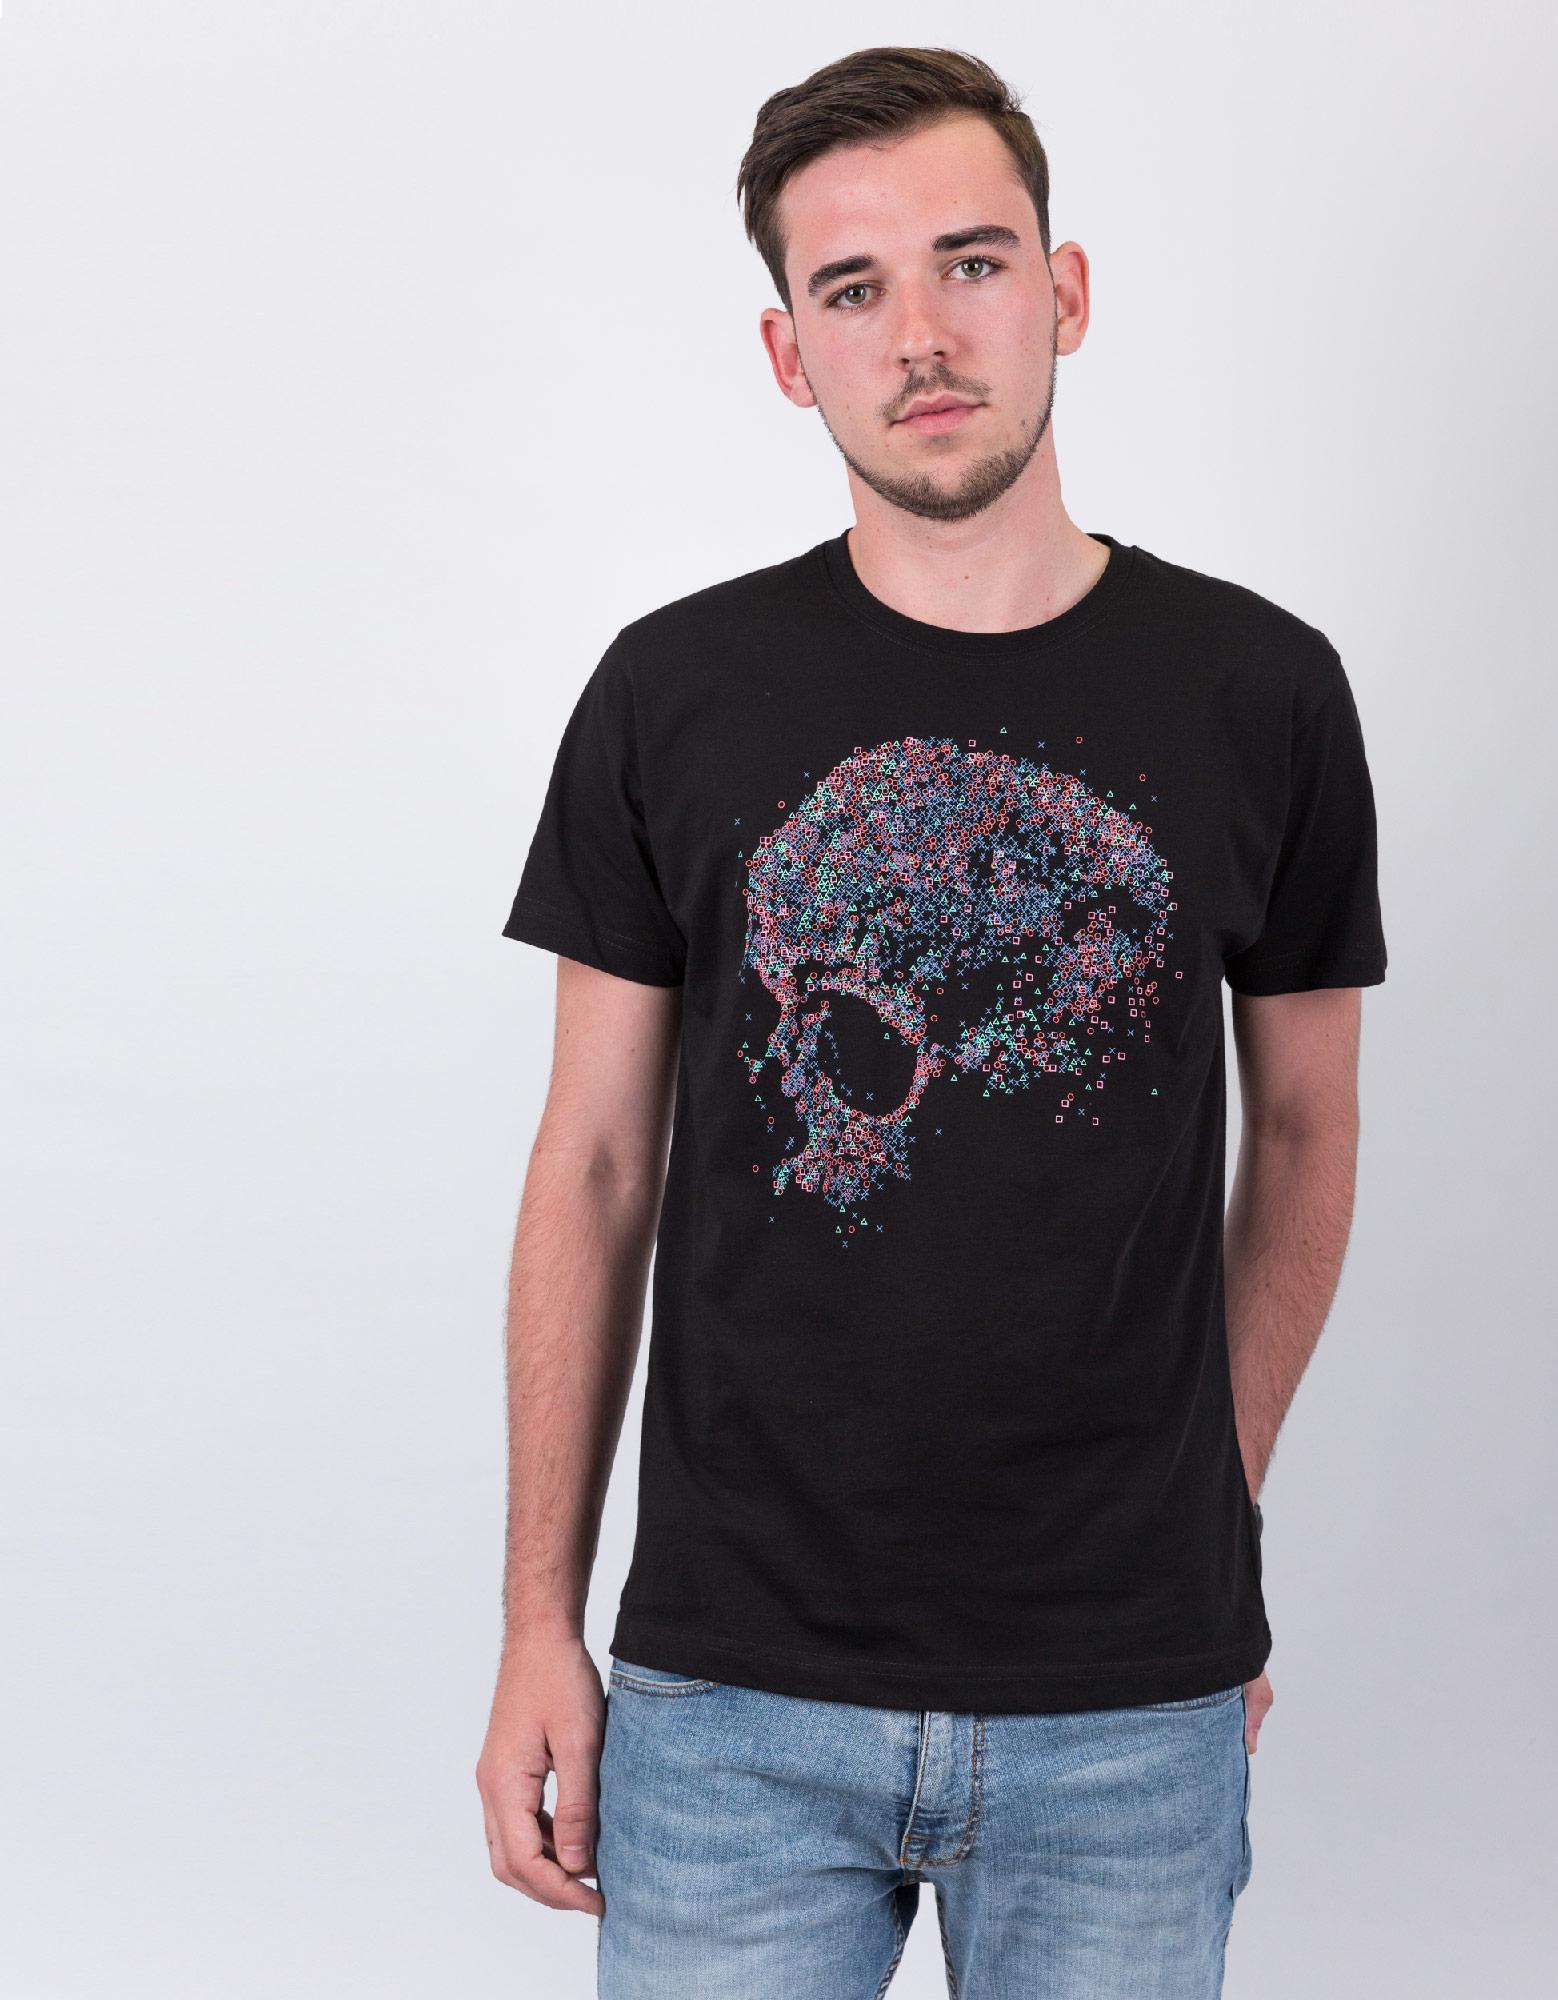 Jo-Bedu Playstation Black Men'S T-Shirt Xl